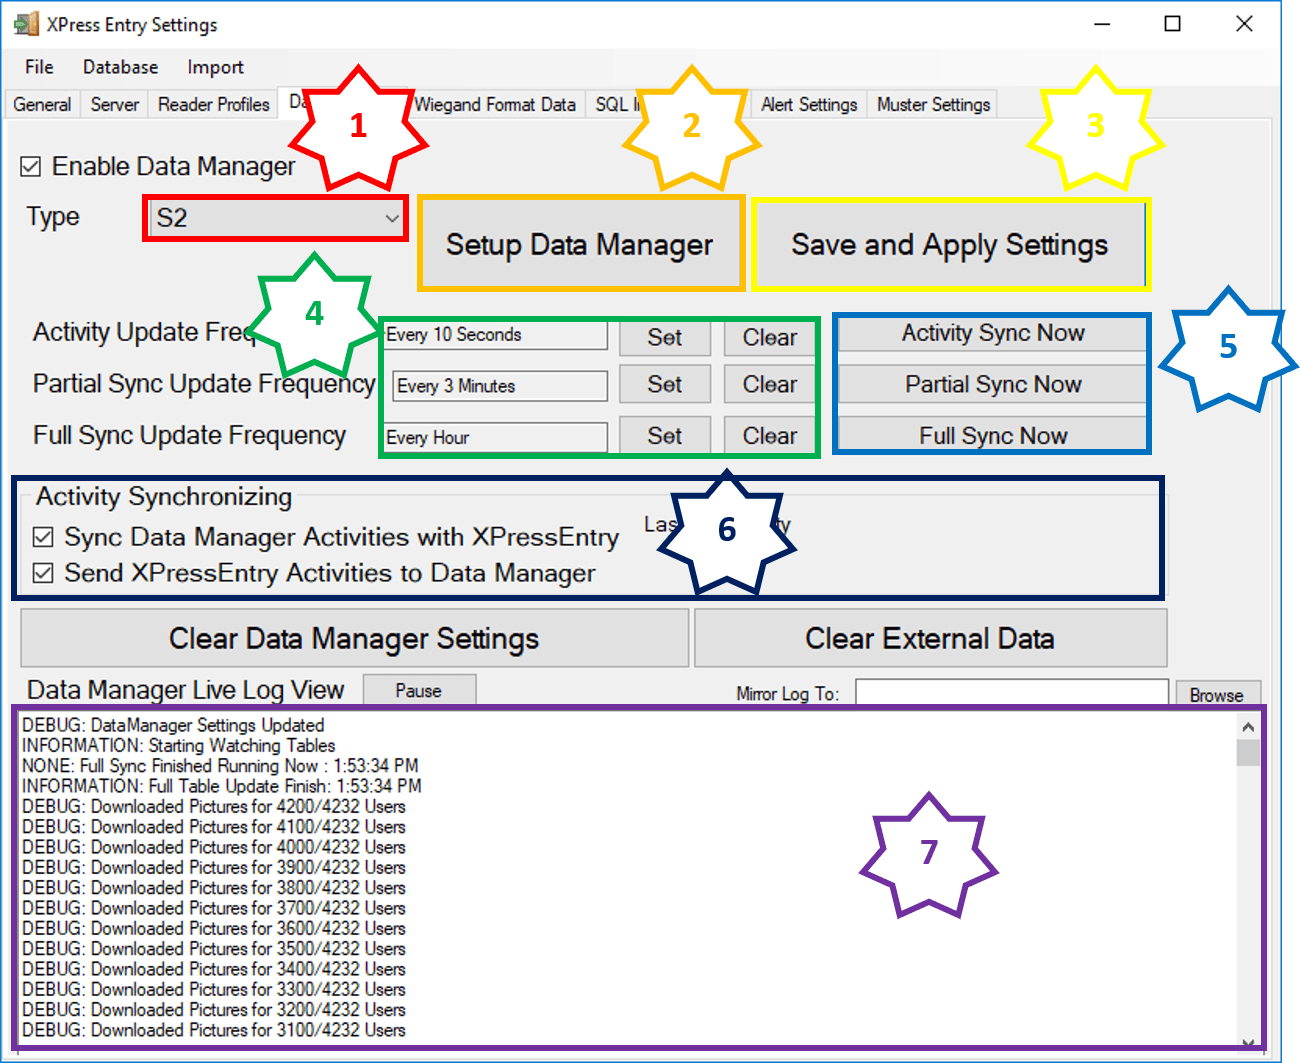 xpressentry s2 데이터 관리자 탭